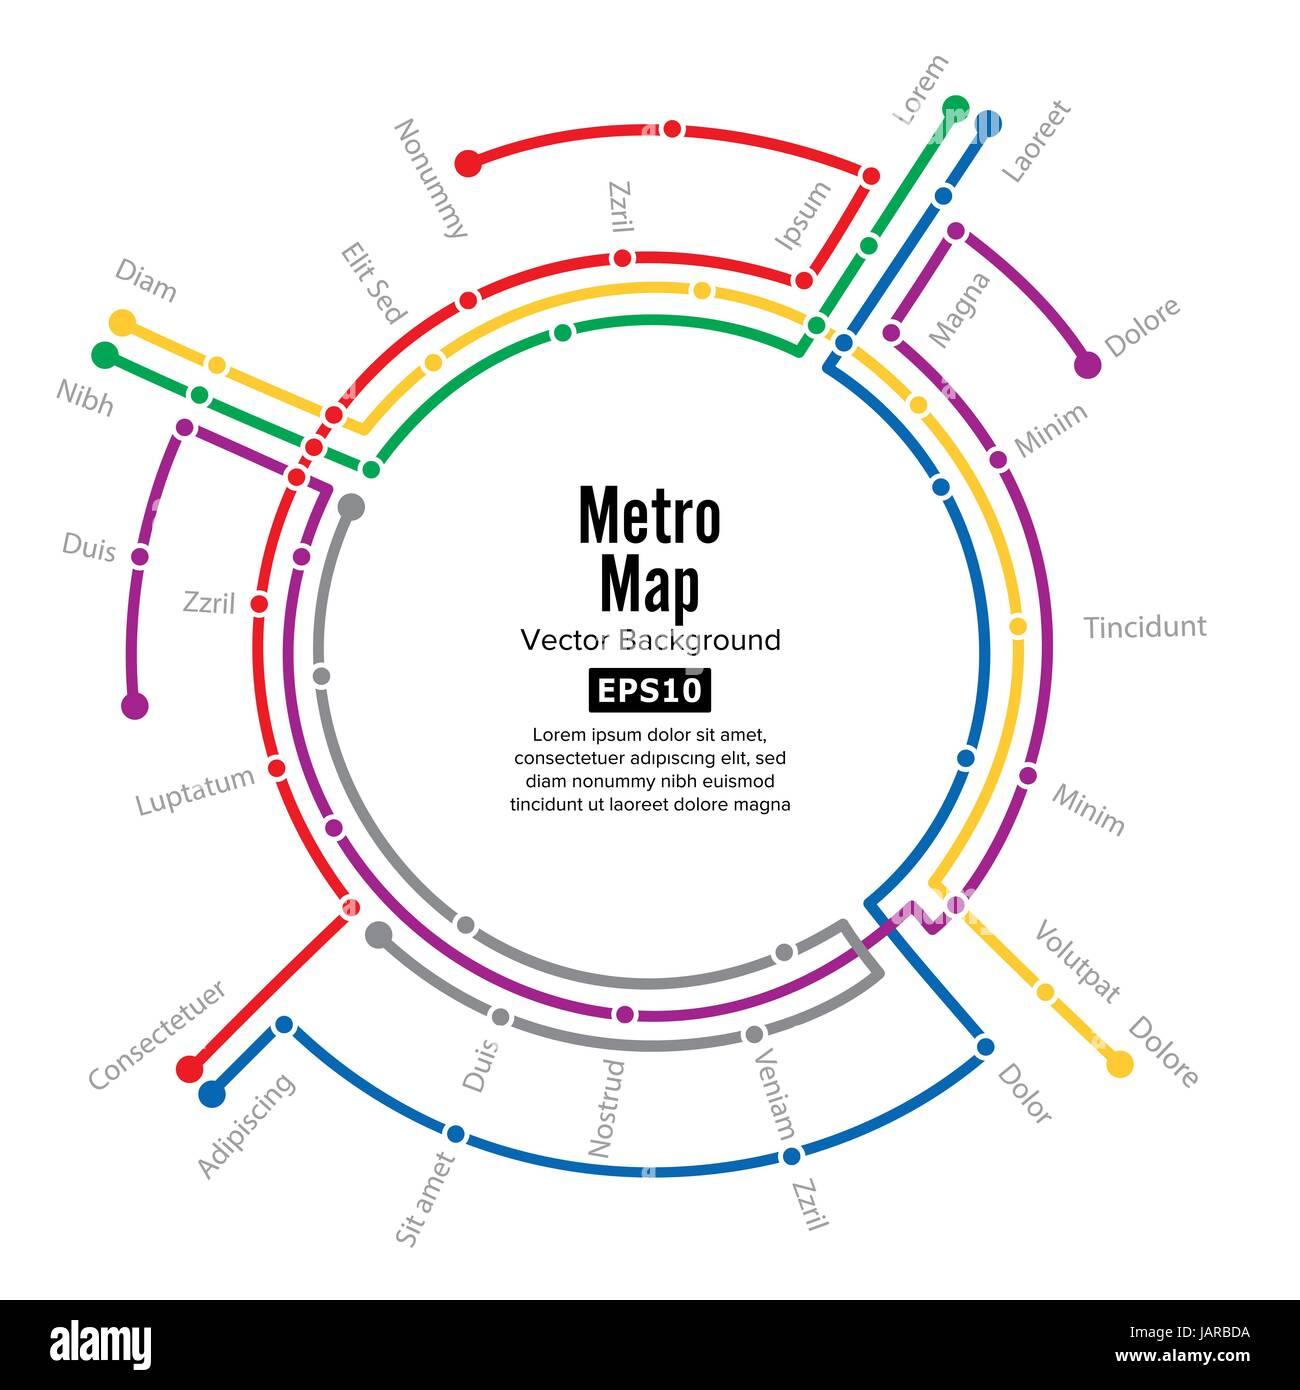 Metro Karte Vektor Plan Karte Station Metro Und U Bahn Metro